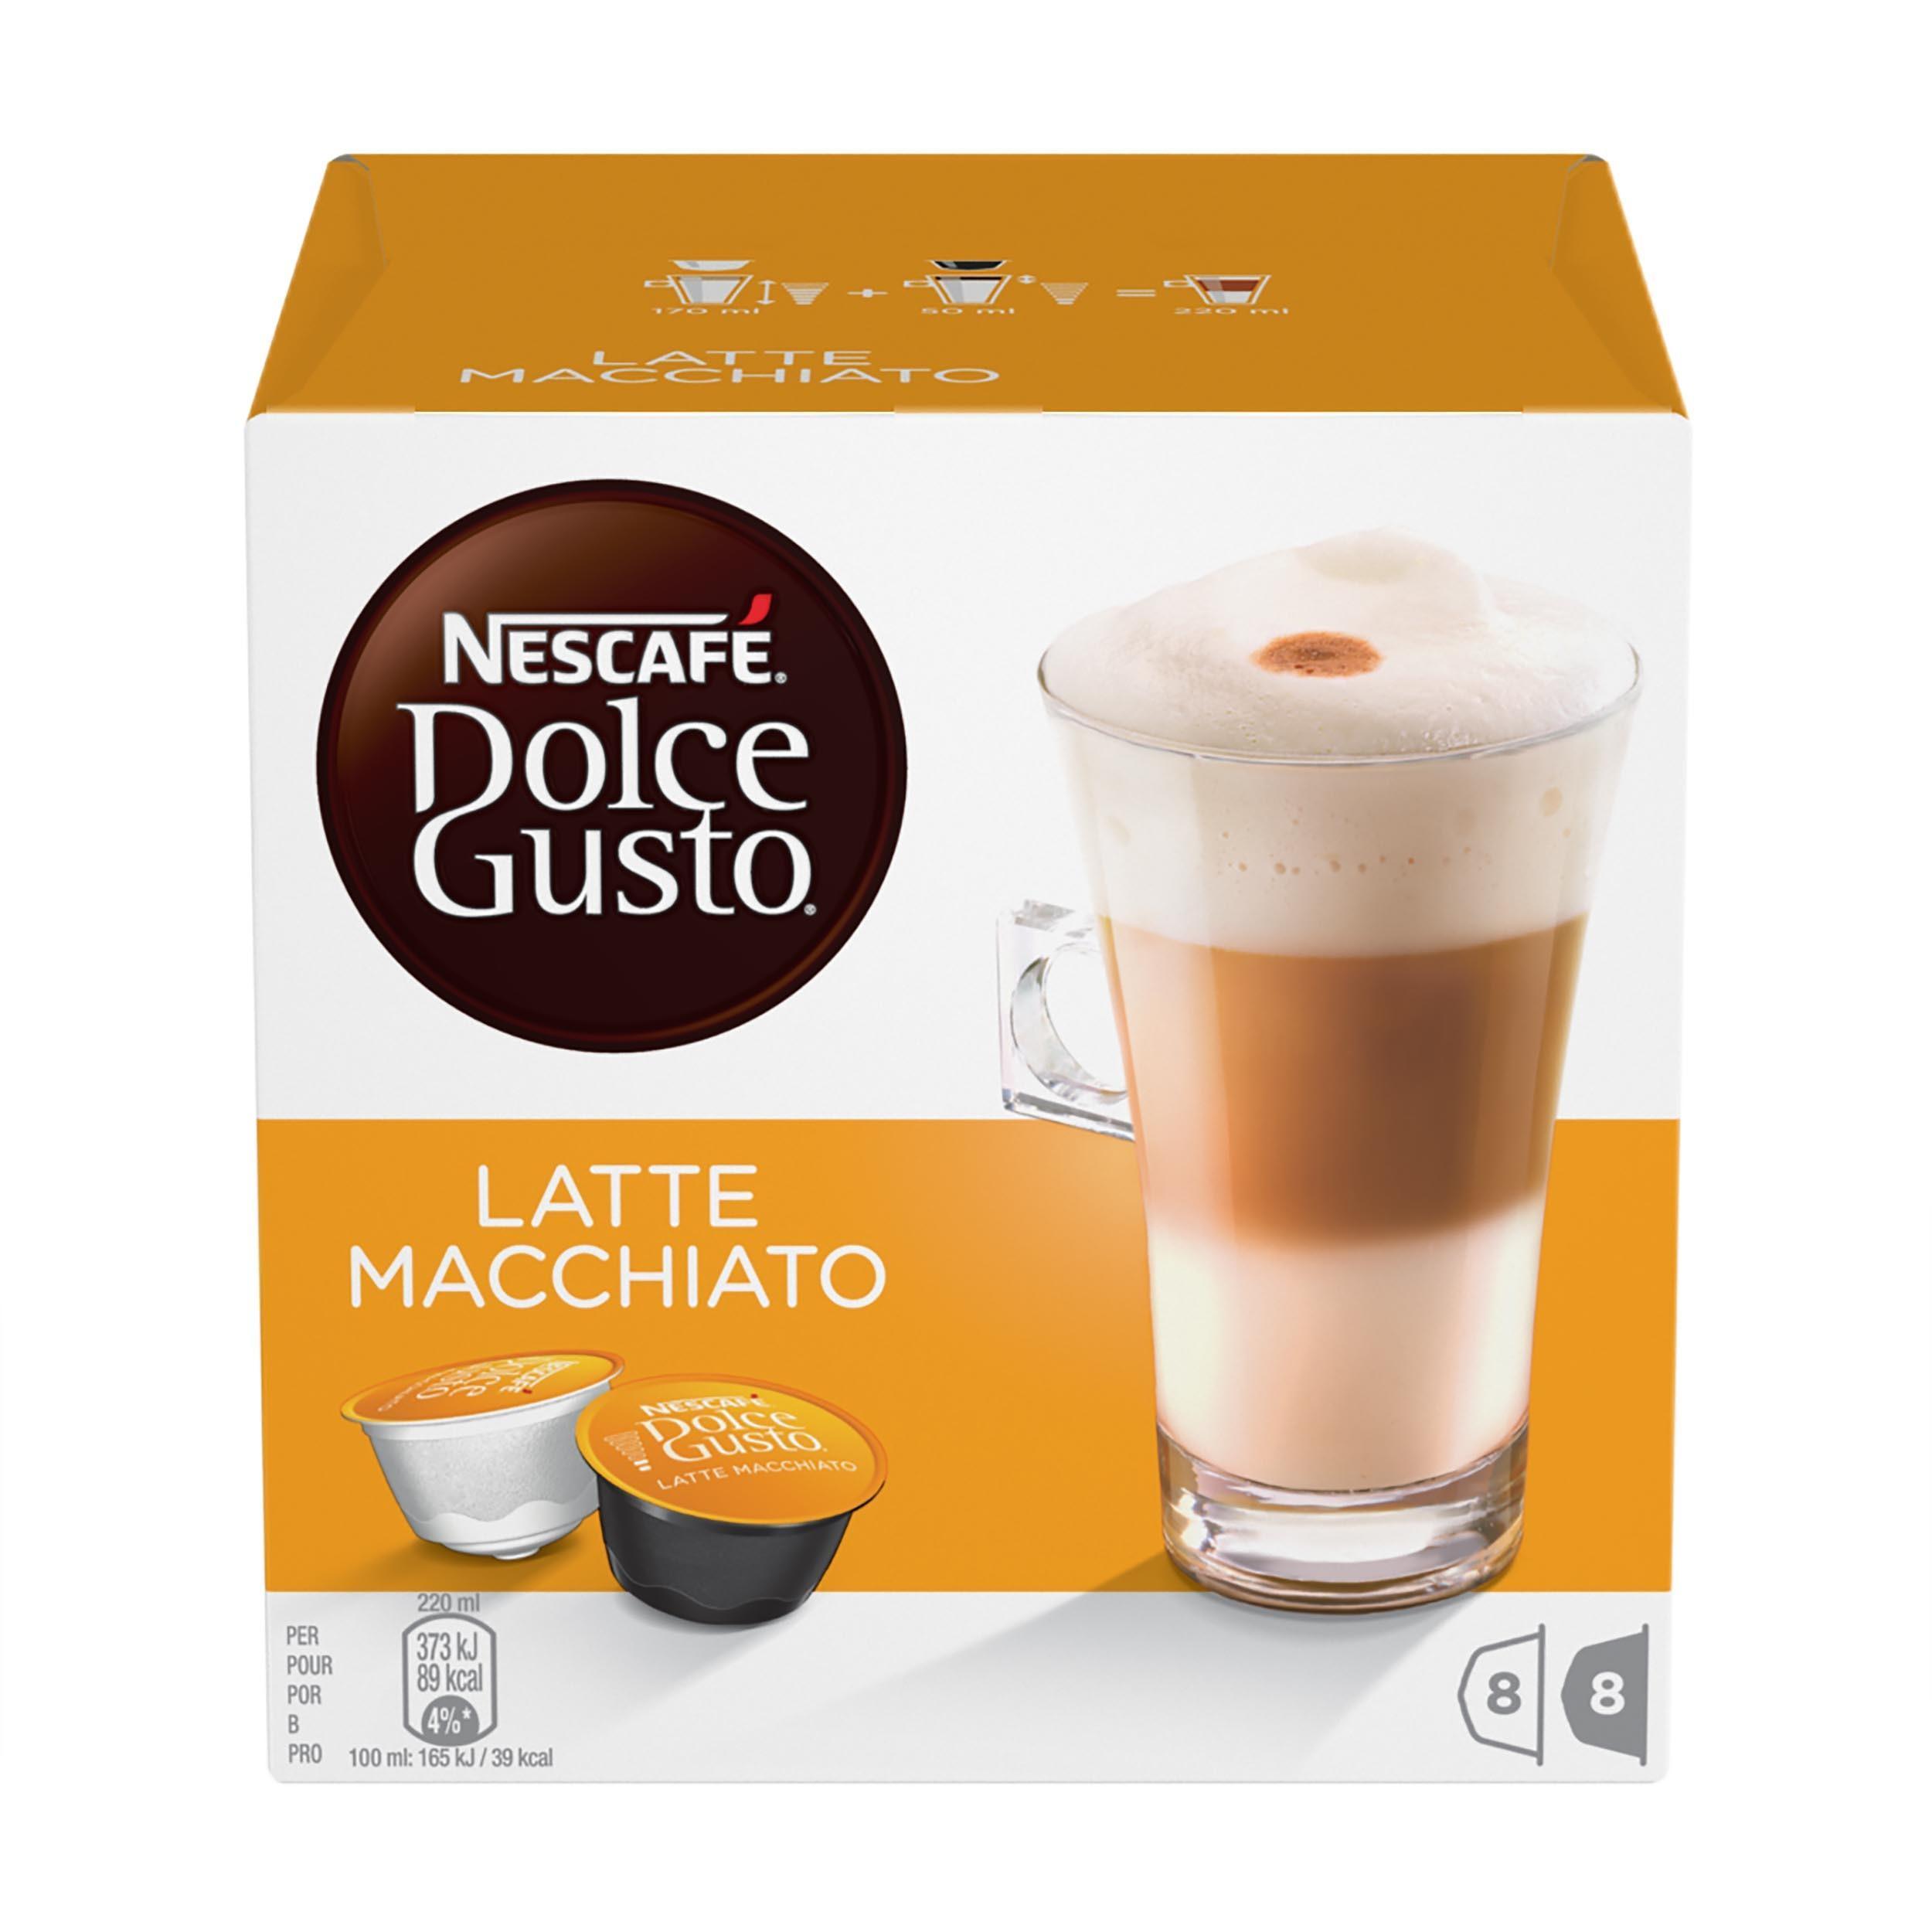 Кофе Nescafe Dolce Gusto Latte Macchiato капсульный 194.4 гр